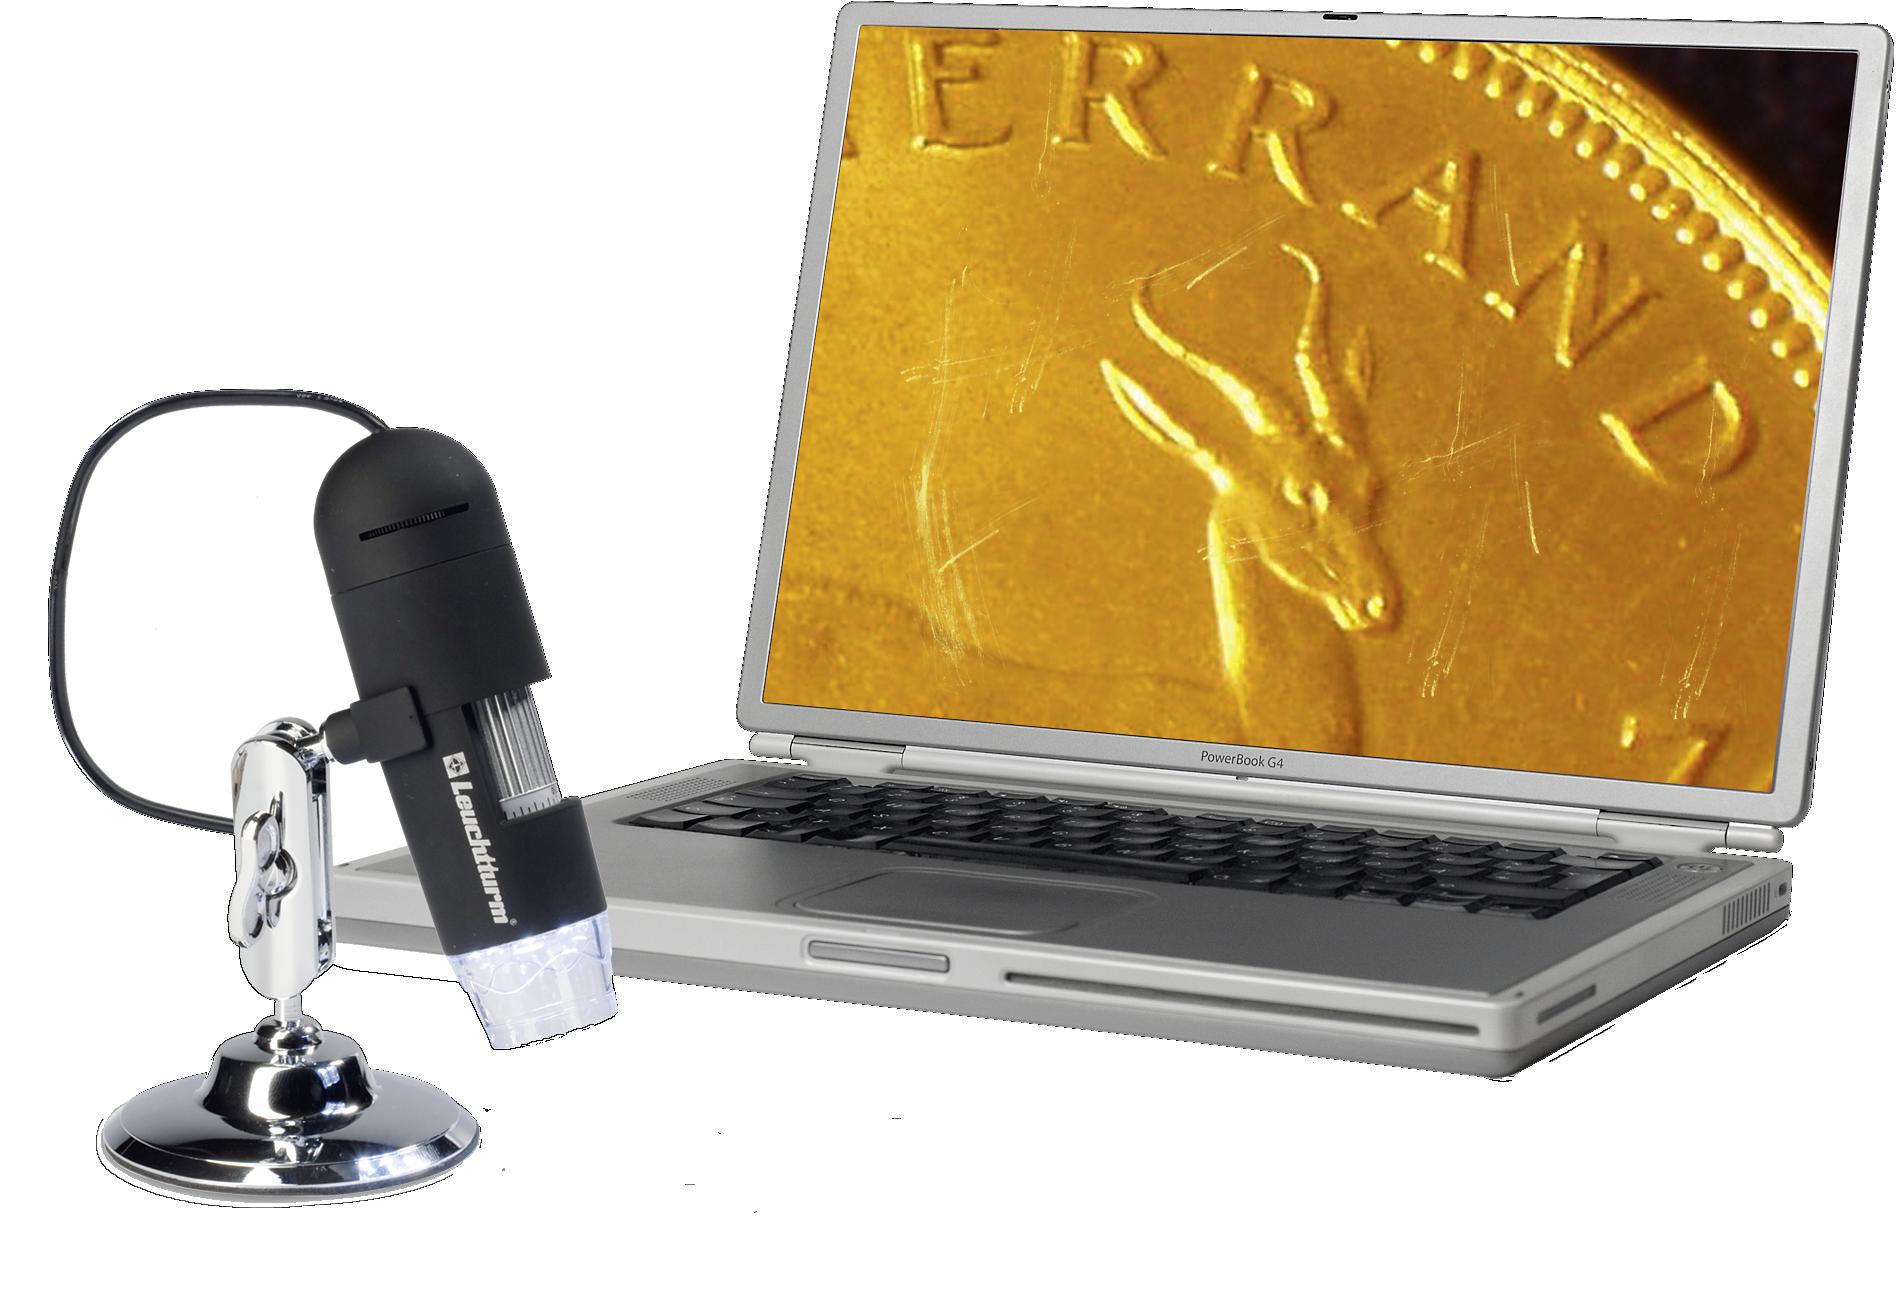 Usb digitalmikroskop bis fache vergrößerung borek